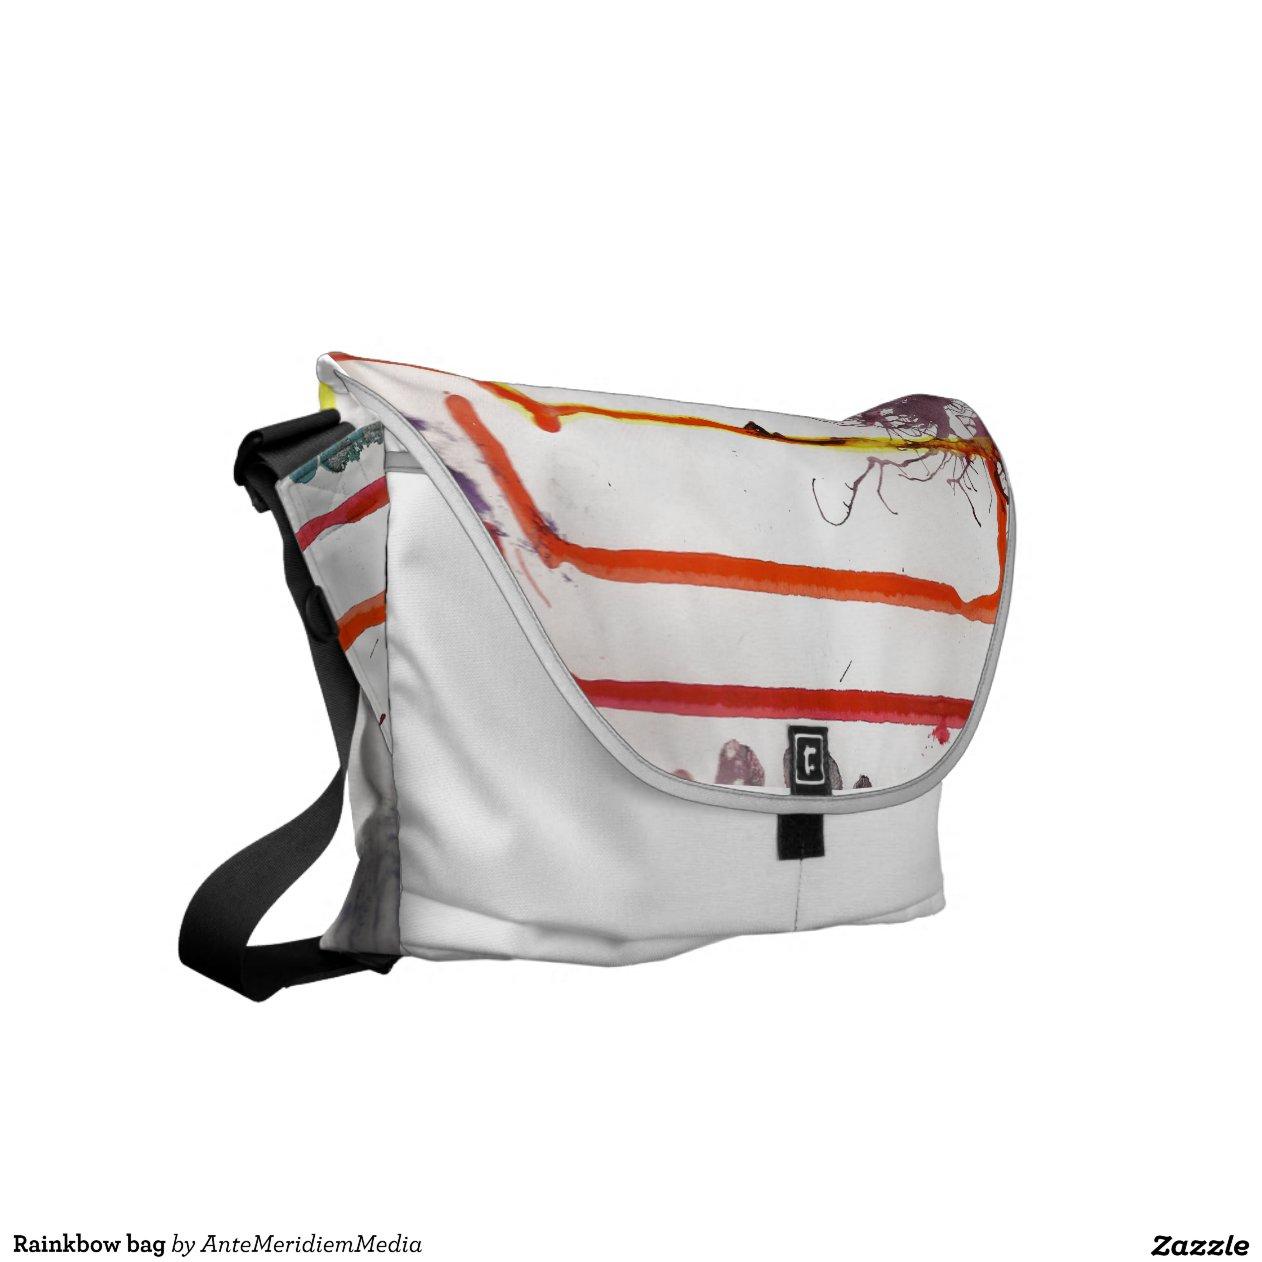 Kawaii Bow Bag Rainkbow Bag Messenger Bags Rcfafcefeeadbe Ipz Byvr